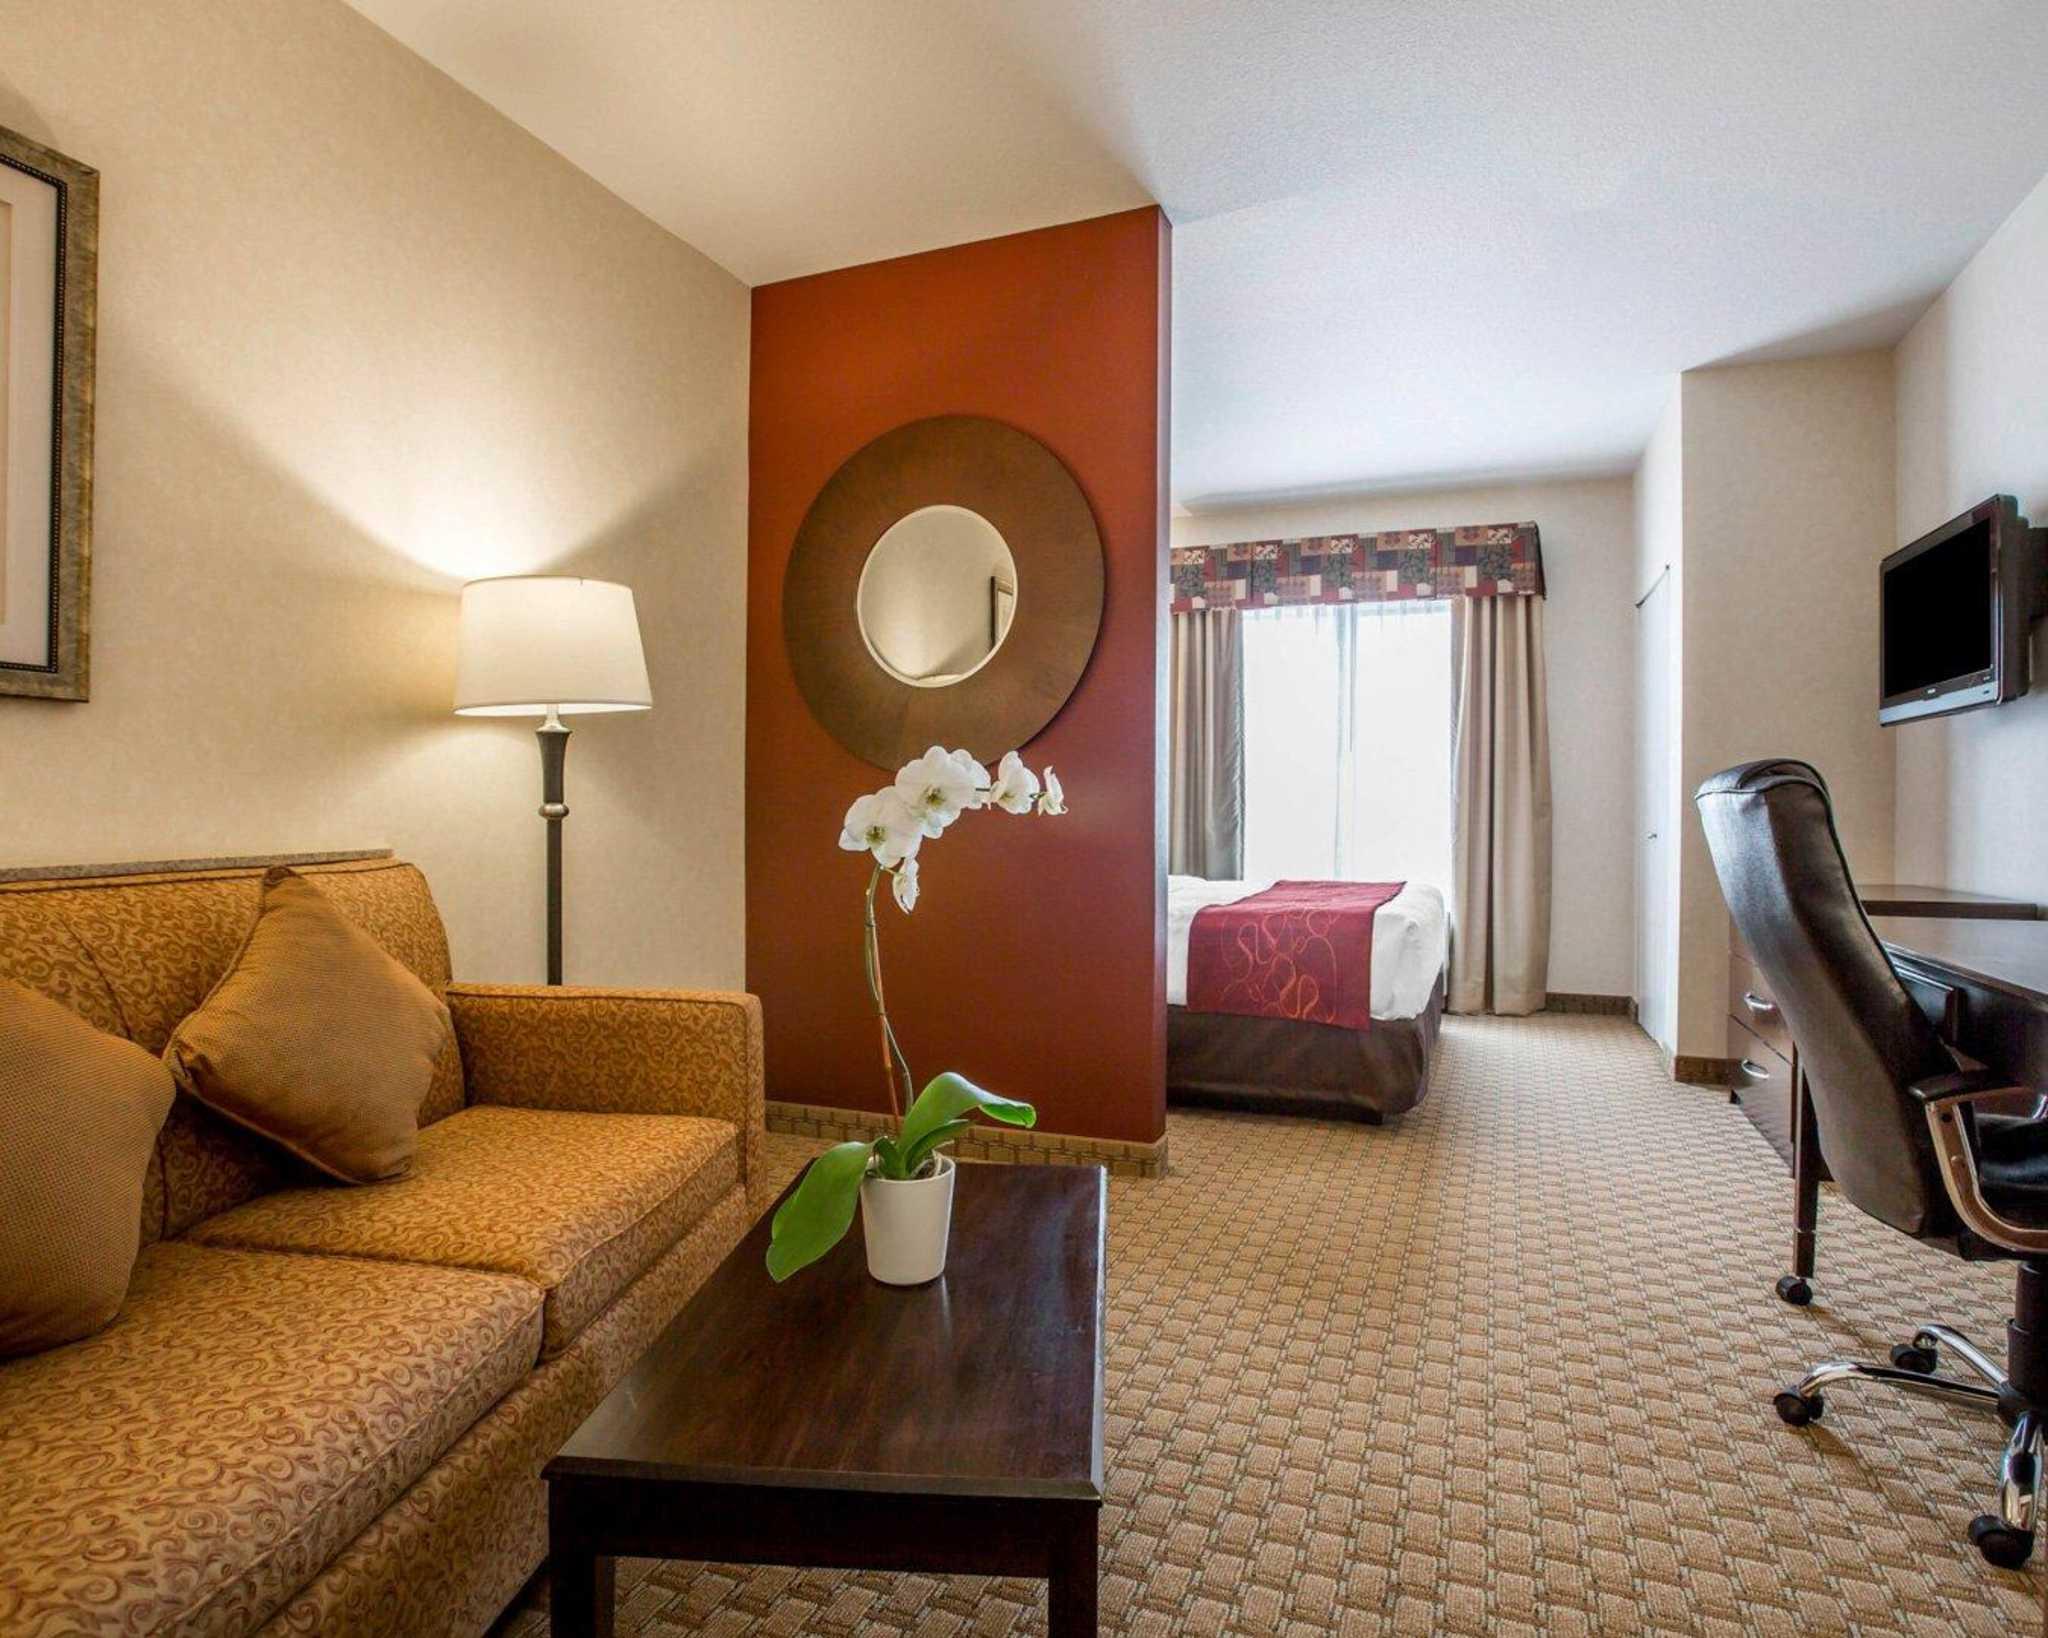 Comfort Suites image 19